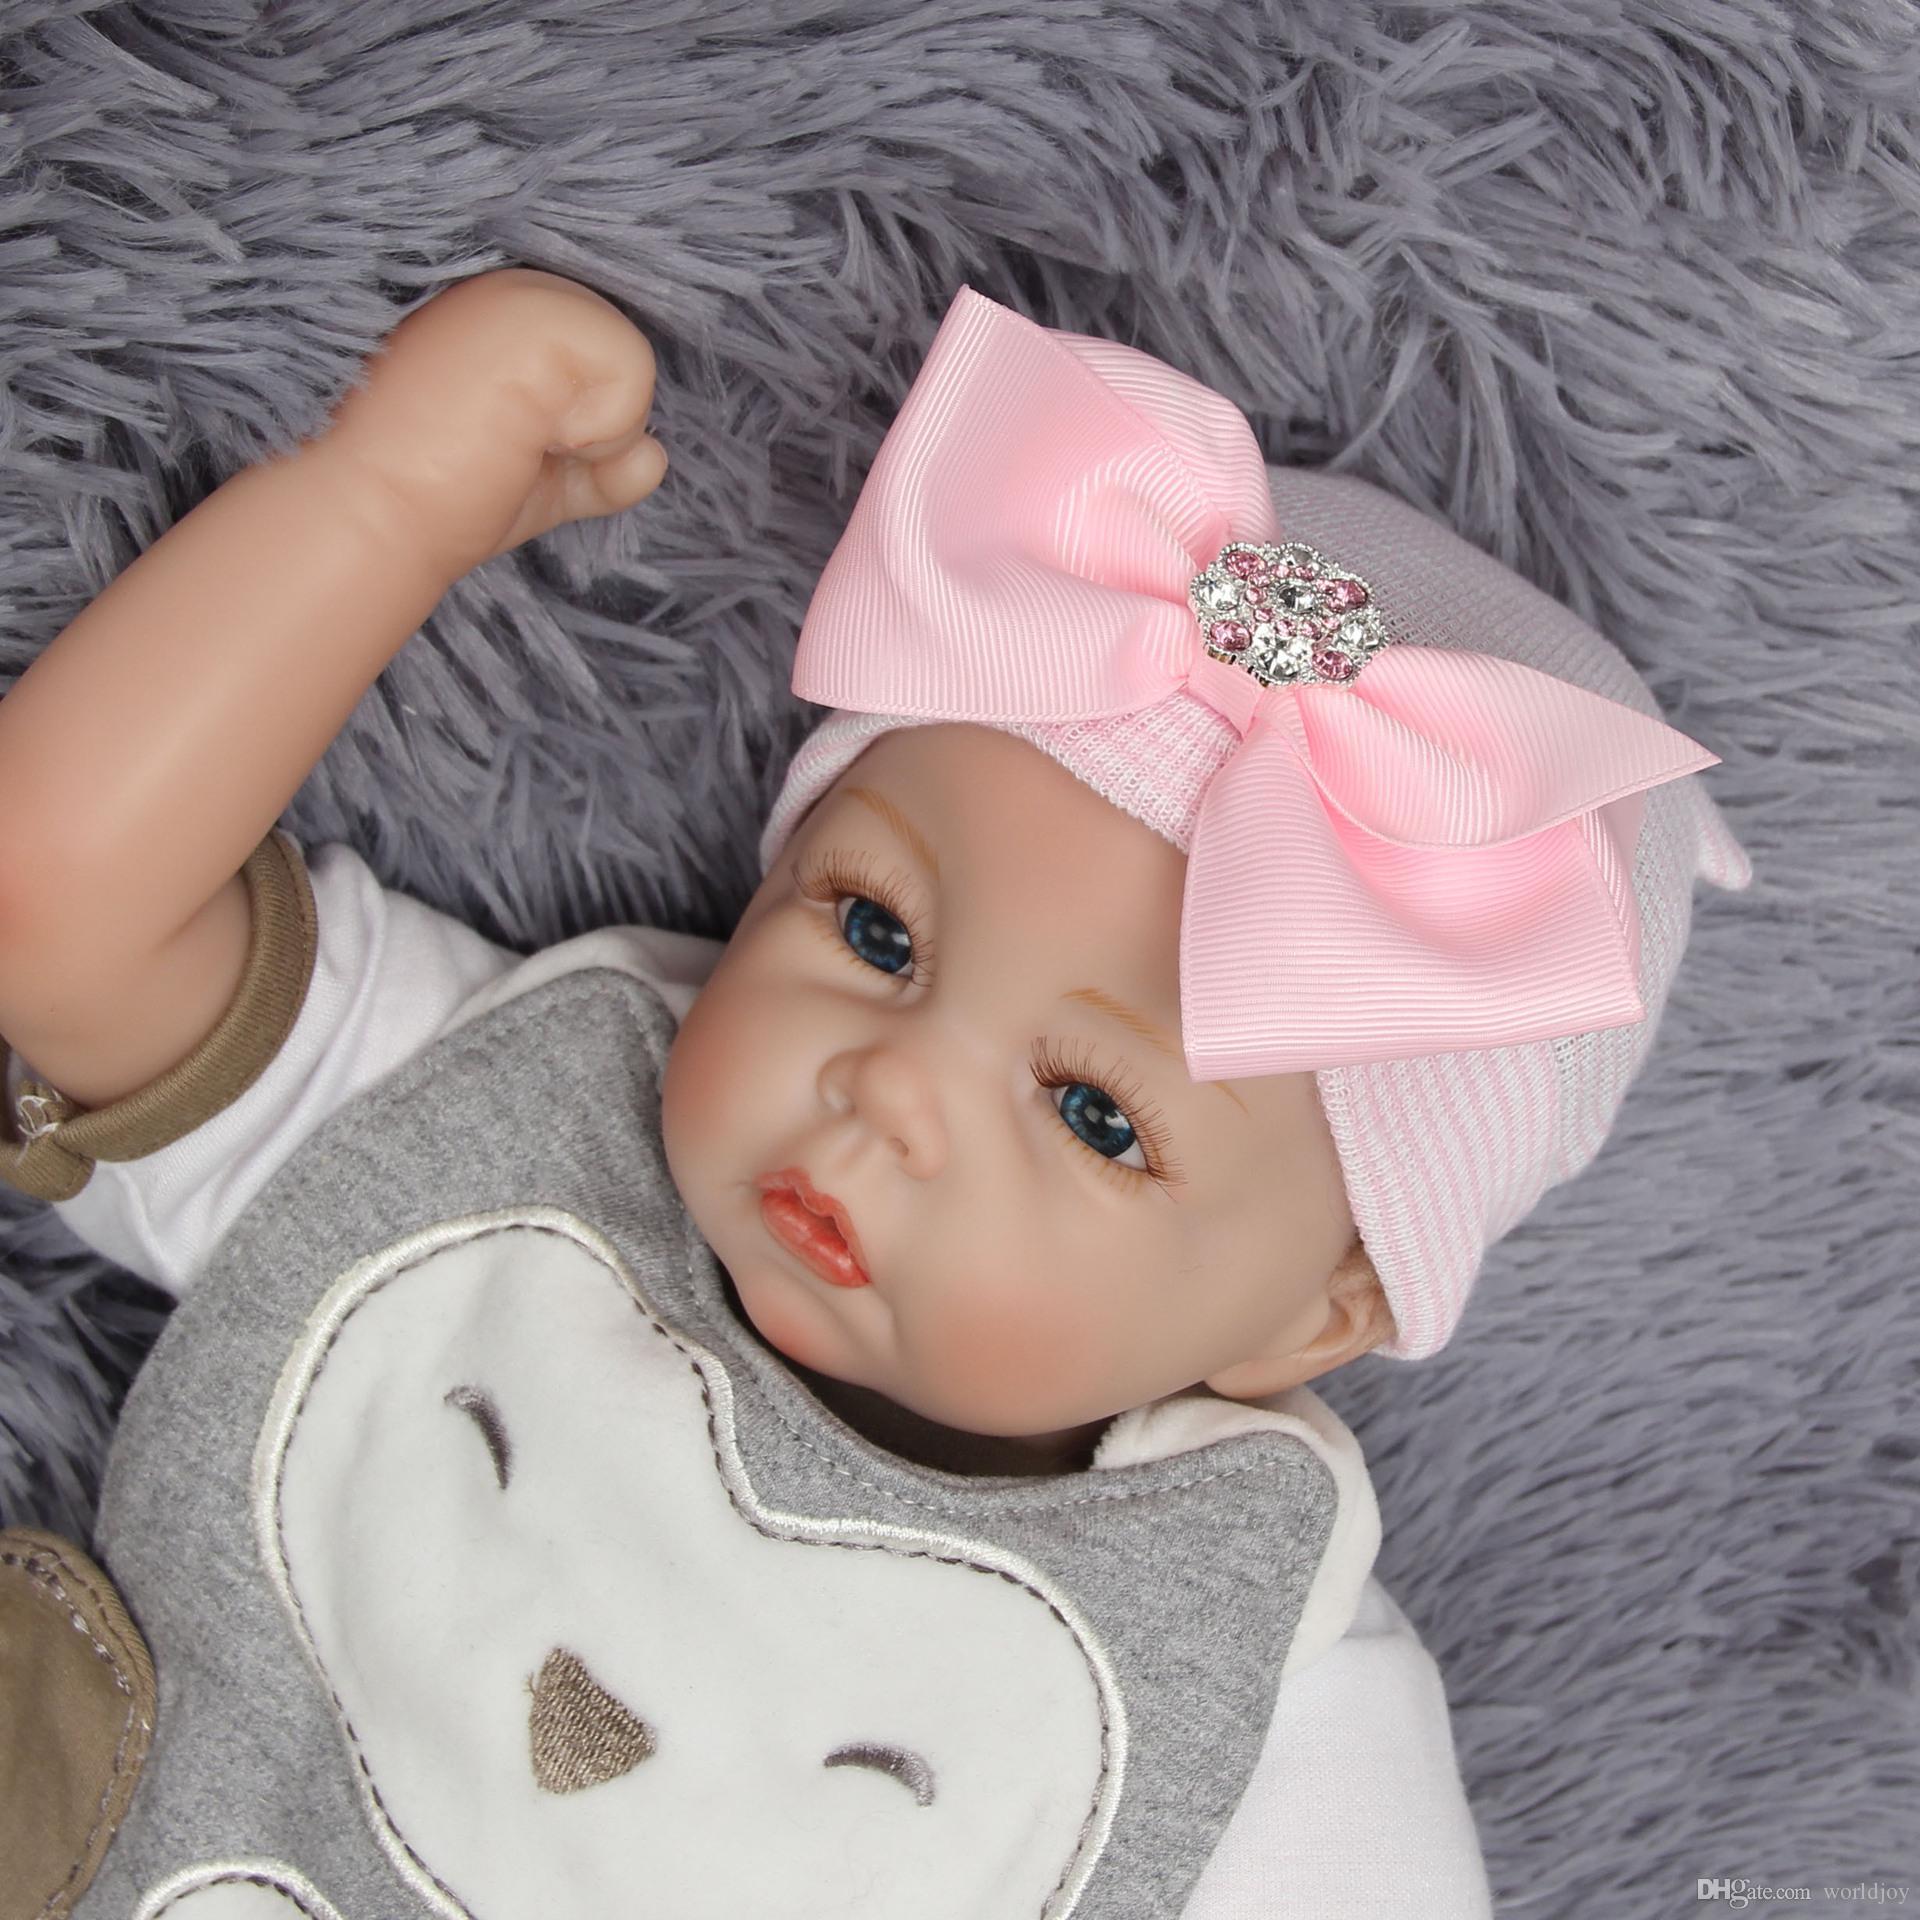 3497bd71eda39 2019 0 3M Baby Crochet Hats With Bow Newborn Baby Girls Nursery Beanie  Hospital Hat Knitting Hedging Caps Autumn Winter Warm Tire Cotton Cap From  Worldjoy